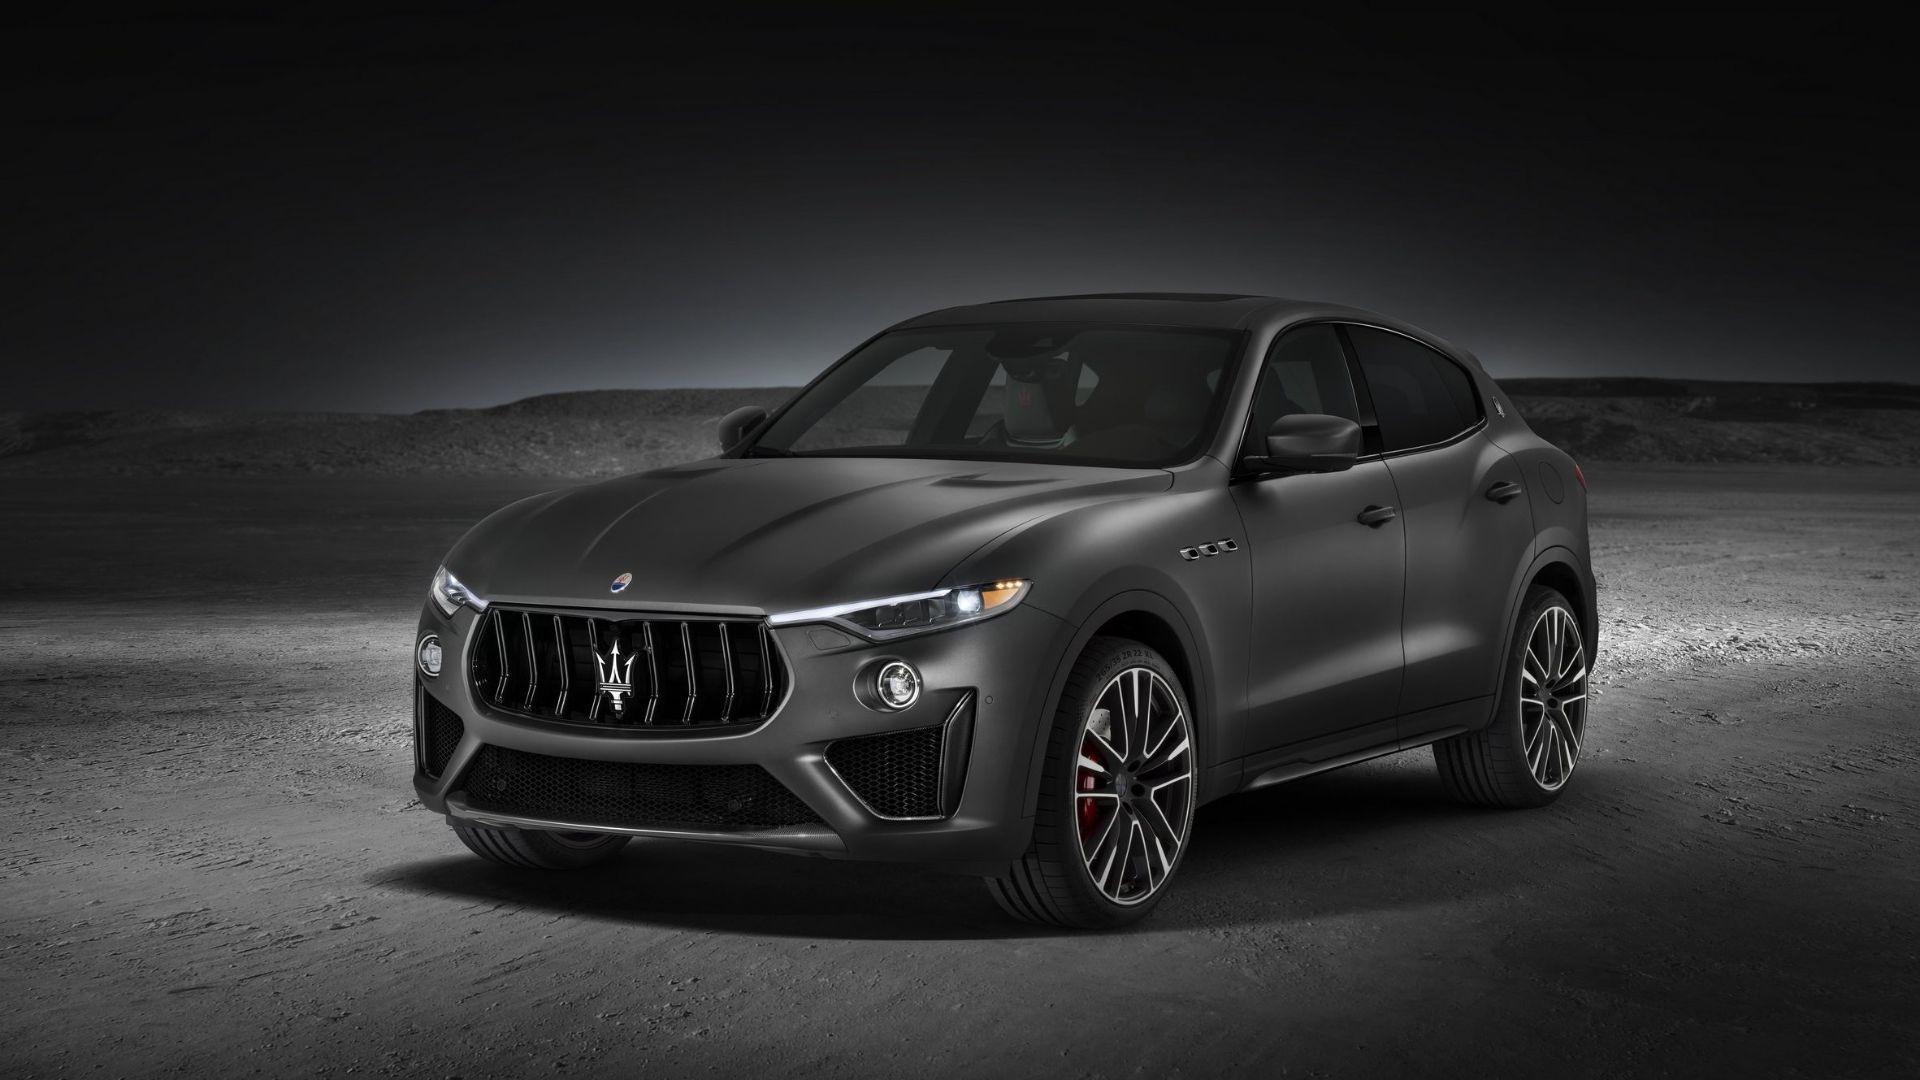 Maserati levante trofeo v8 front 1